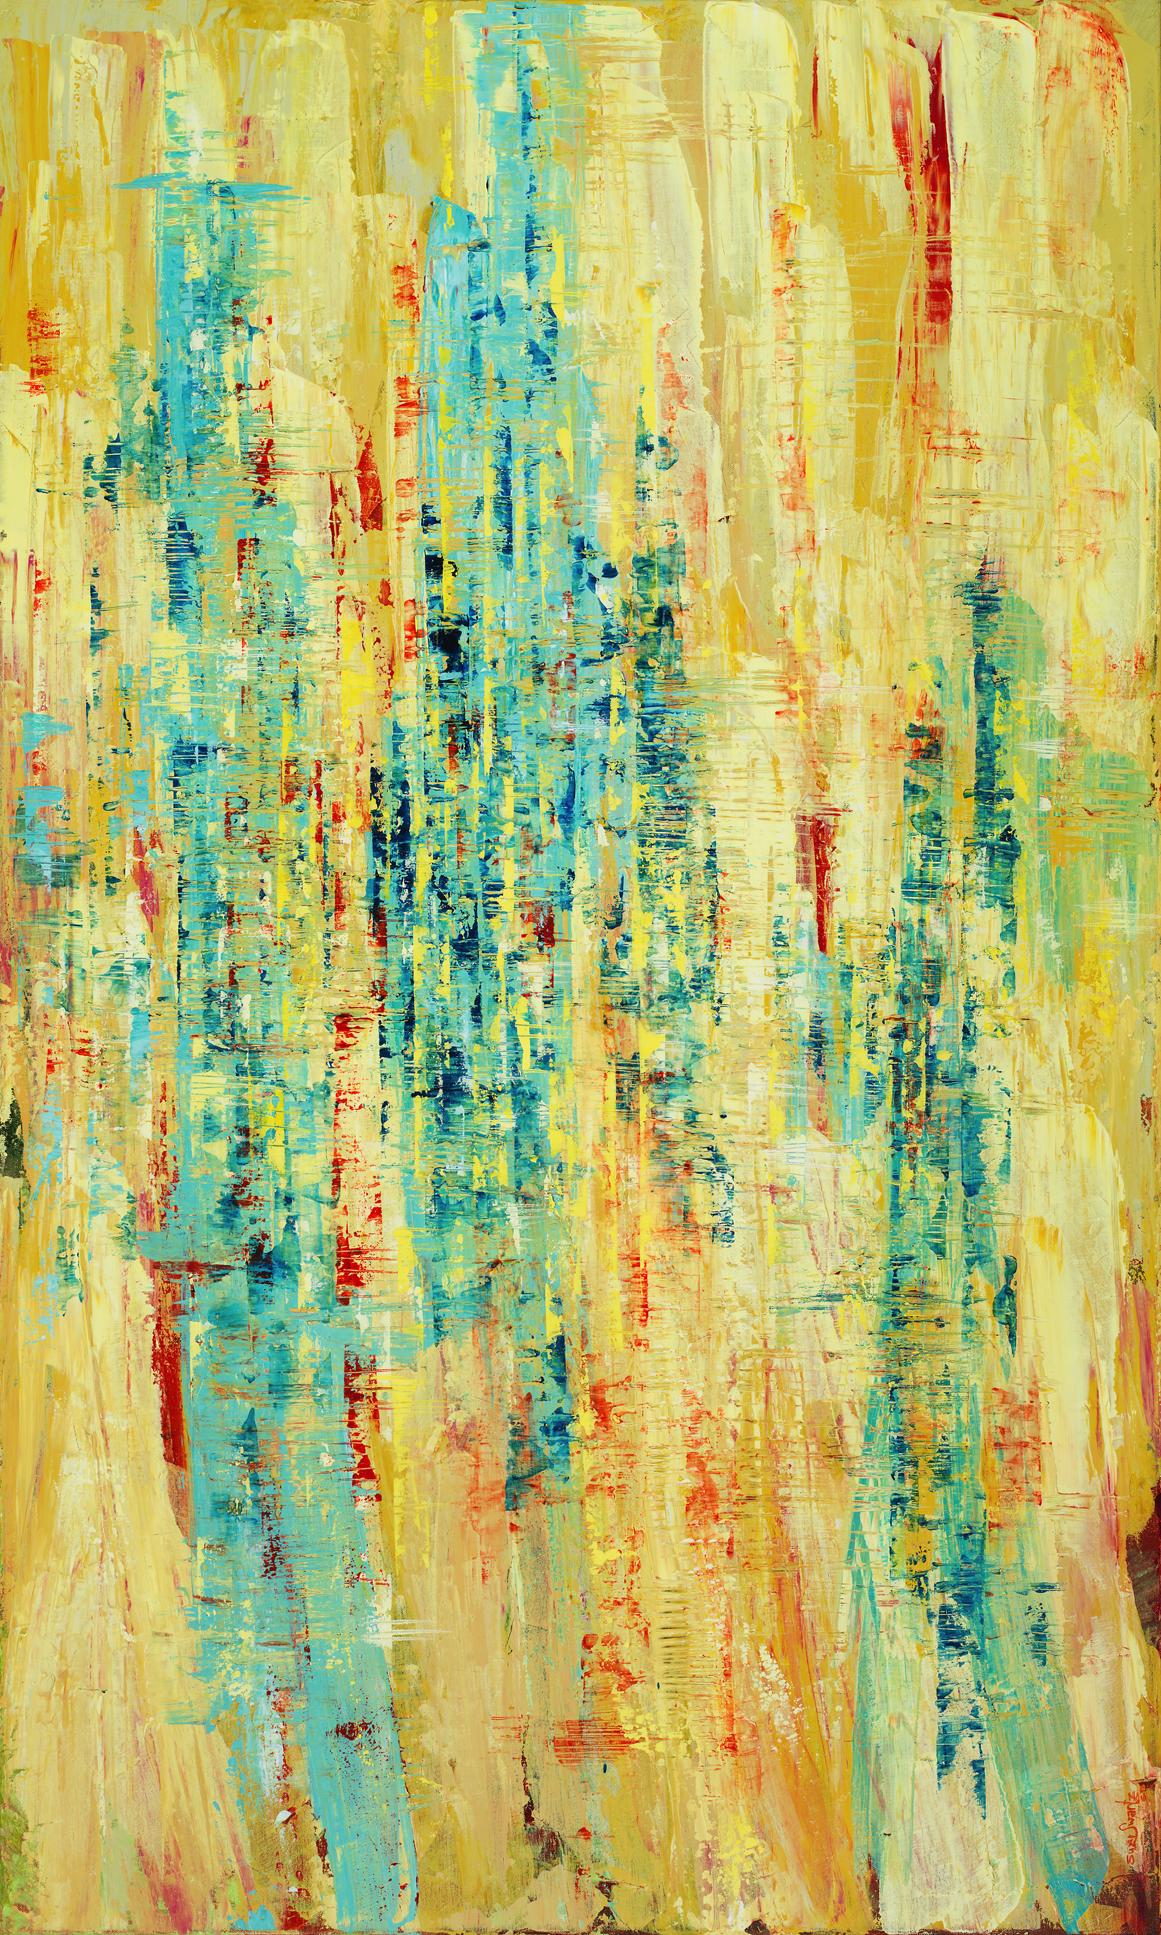 Landscape of Resonances 004  36 x 60